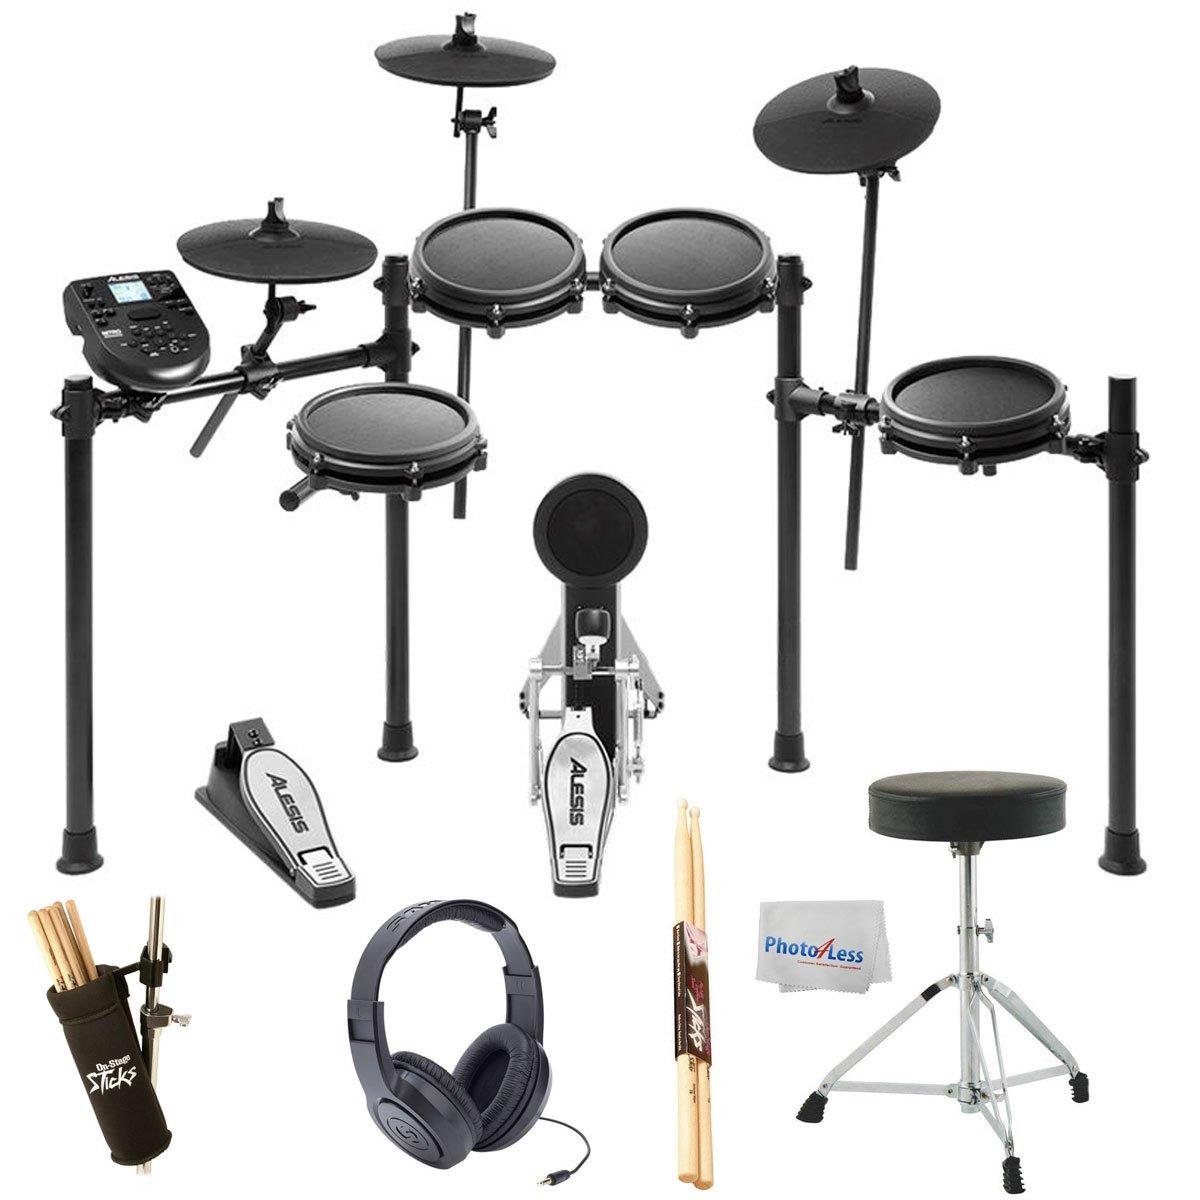 Alesis Nitro Mesh Electronic Drum Kit + Samson SR350 Studio Headphones + On Stage Drum Stick Holder DA100 + Braced Drum Throne + Maple Wood 5B Drumsticks - Photo4Less Clean Cloth- Top Accessory Bundle